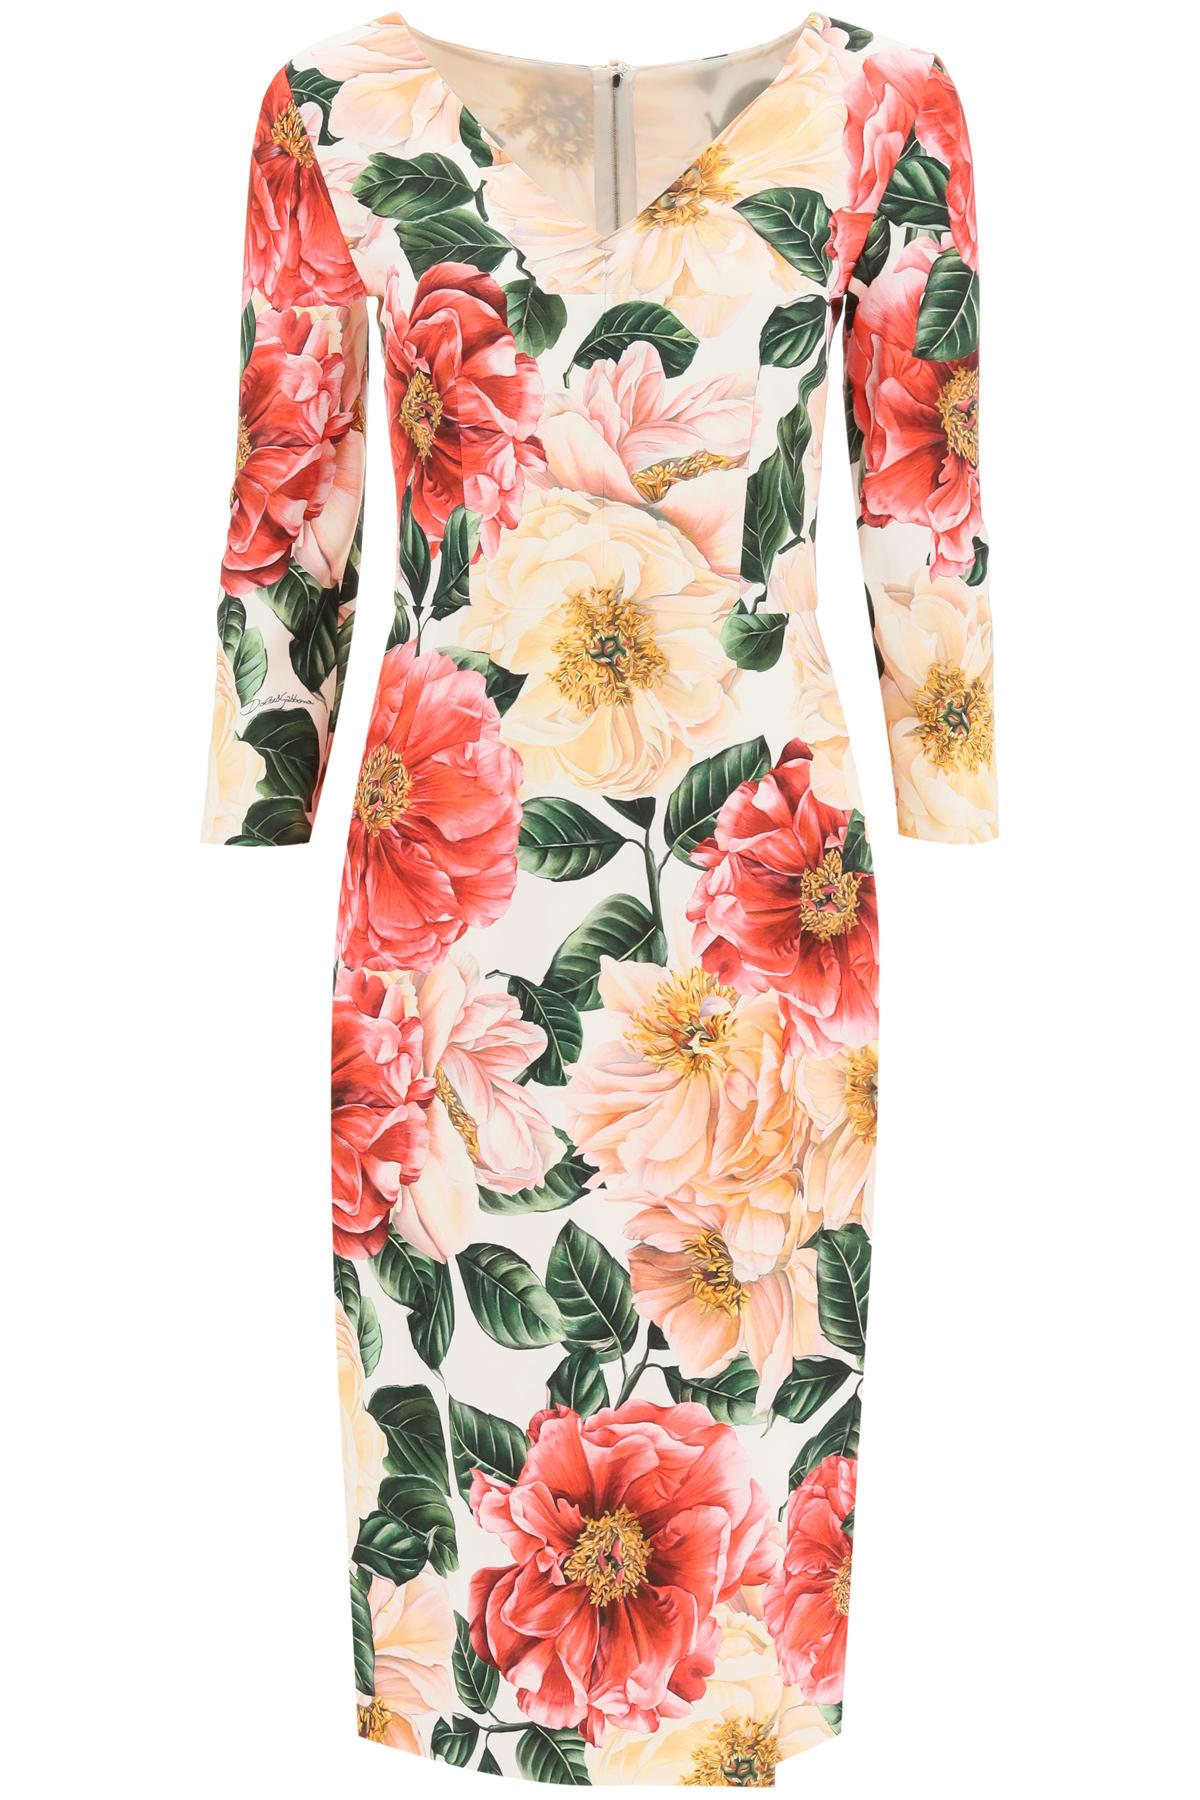 DOLCE & GABBANA CAMELLIA PRINT CADY DRESS 42 Fuchsia, Beige, Pink